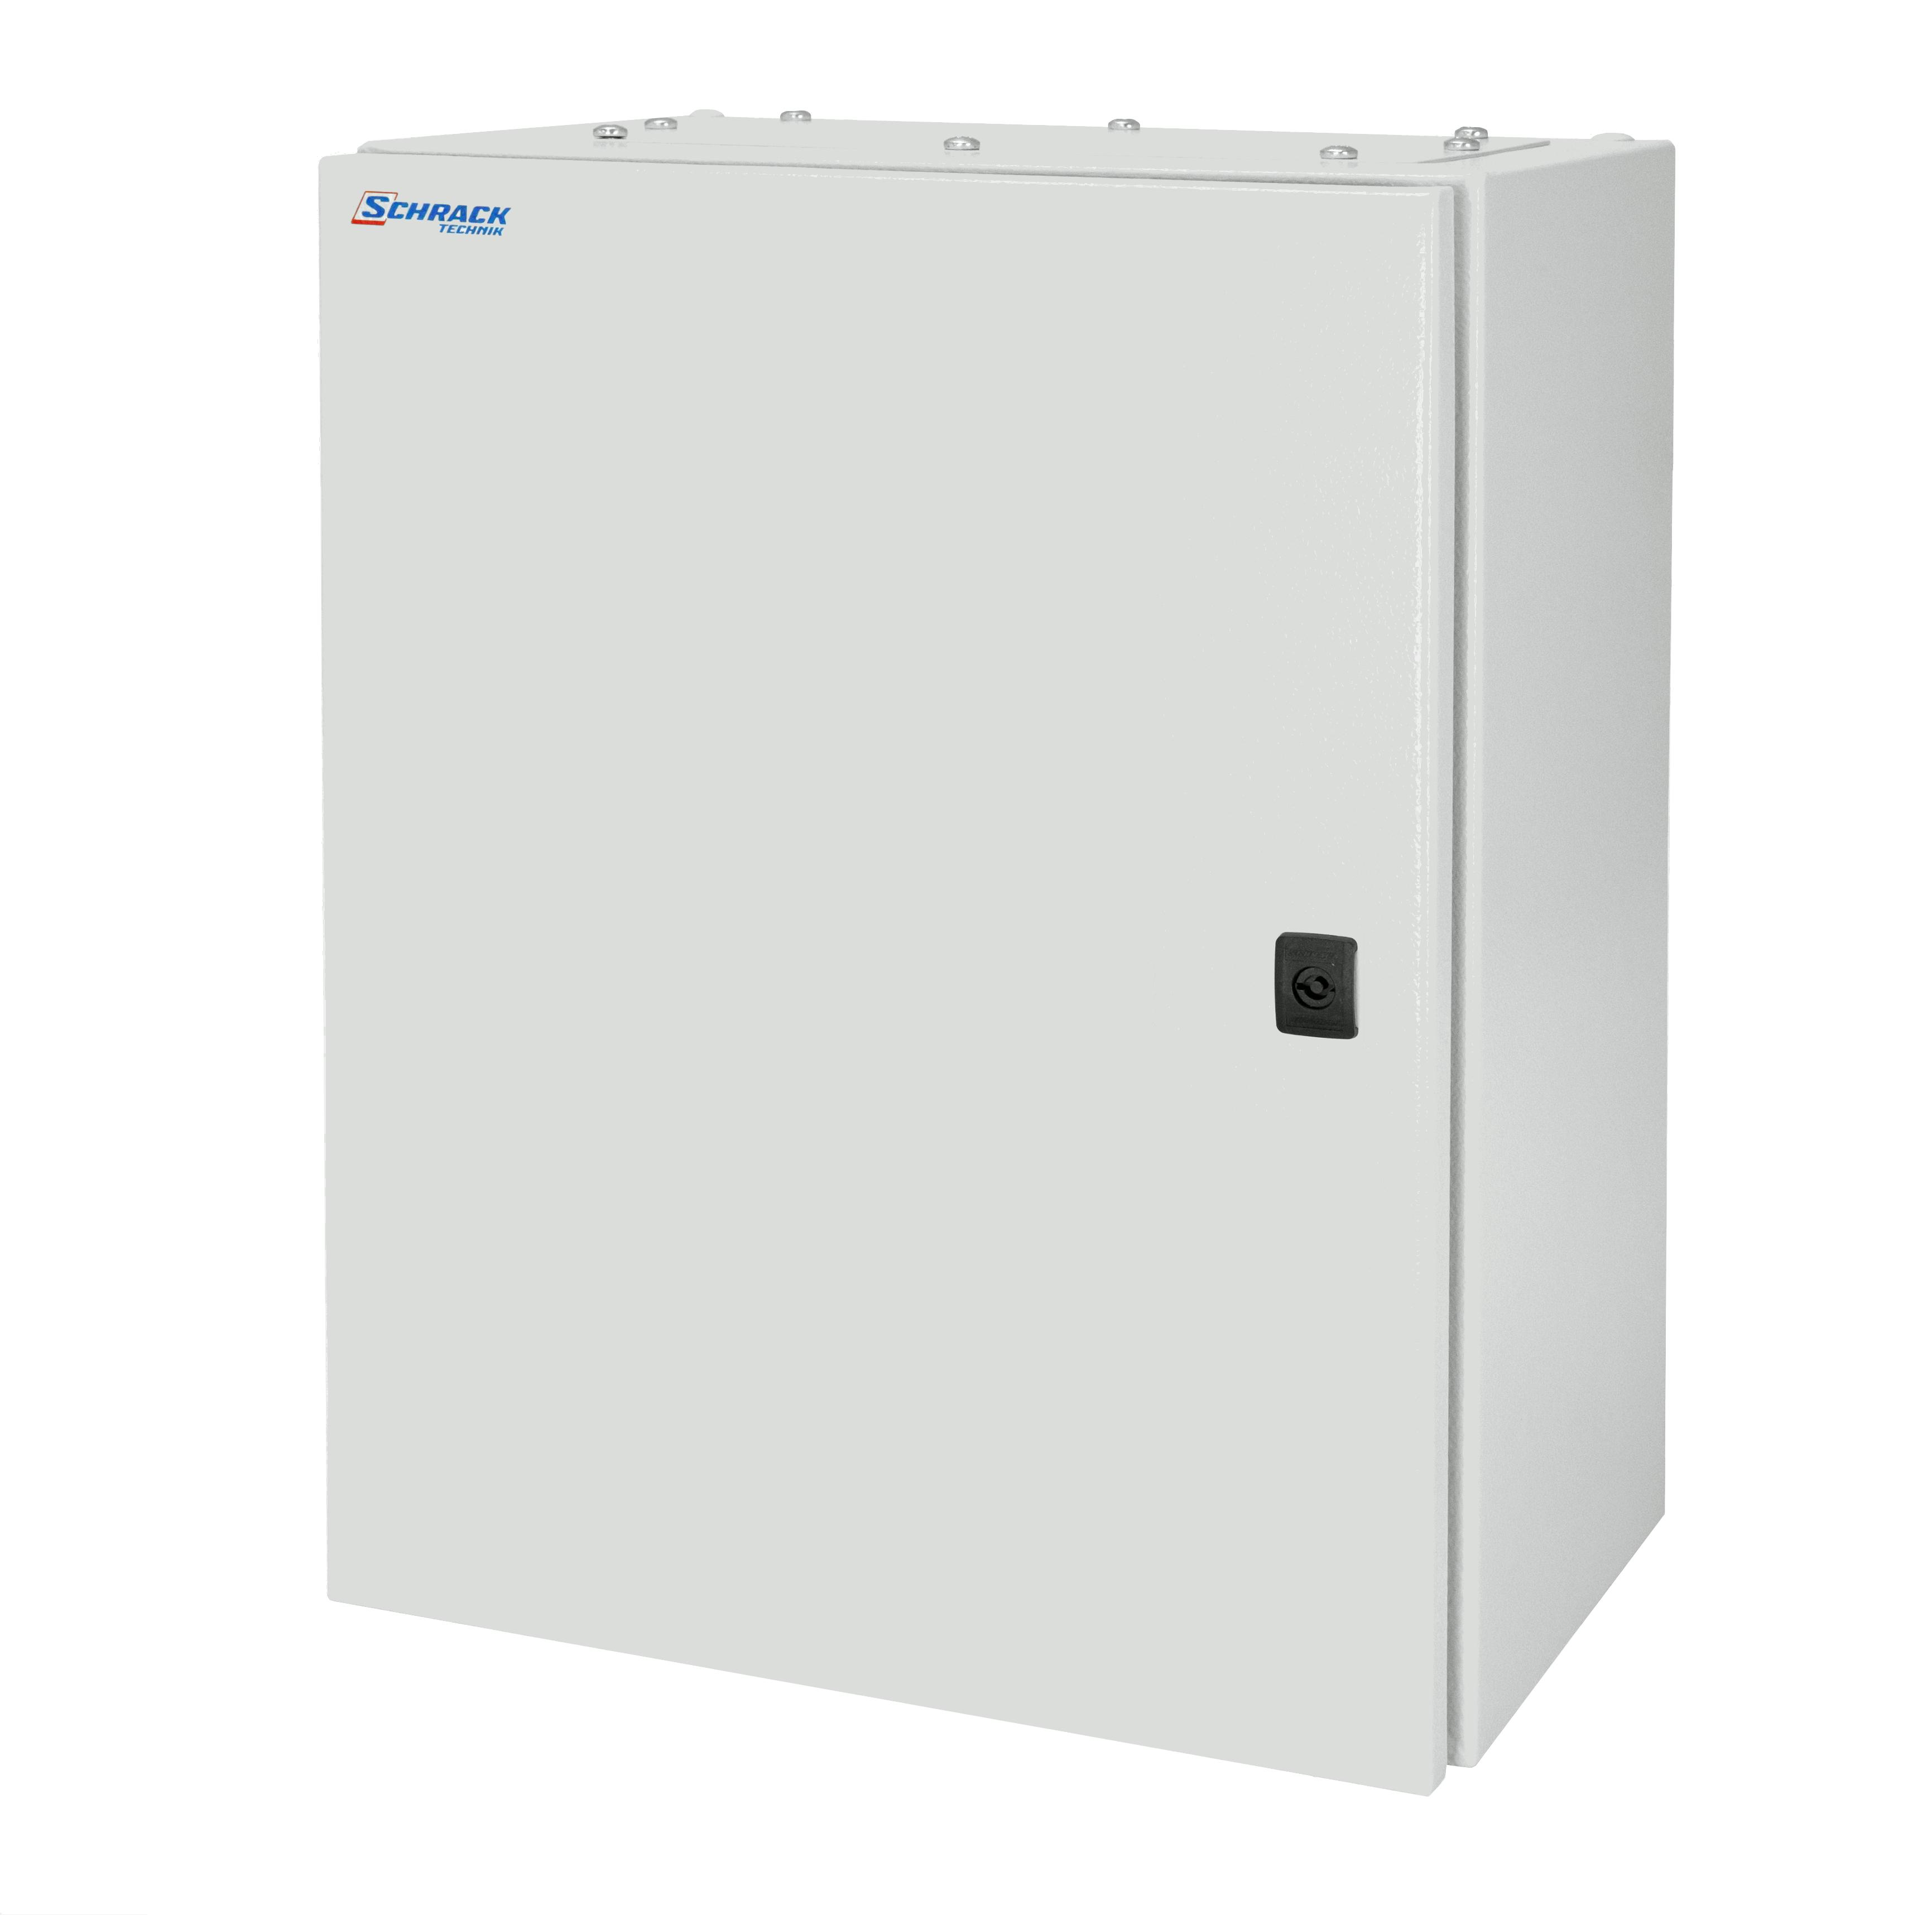 1 Stk Wandschrank Mono IP66 H=500 B=500 T=210 Stahlblech WSM5050210